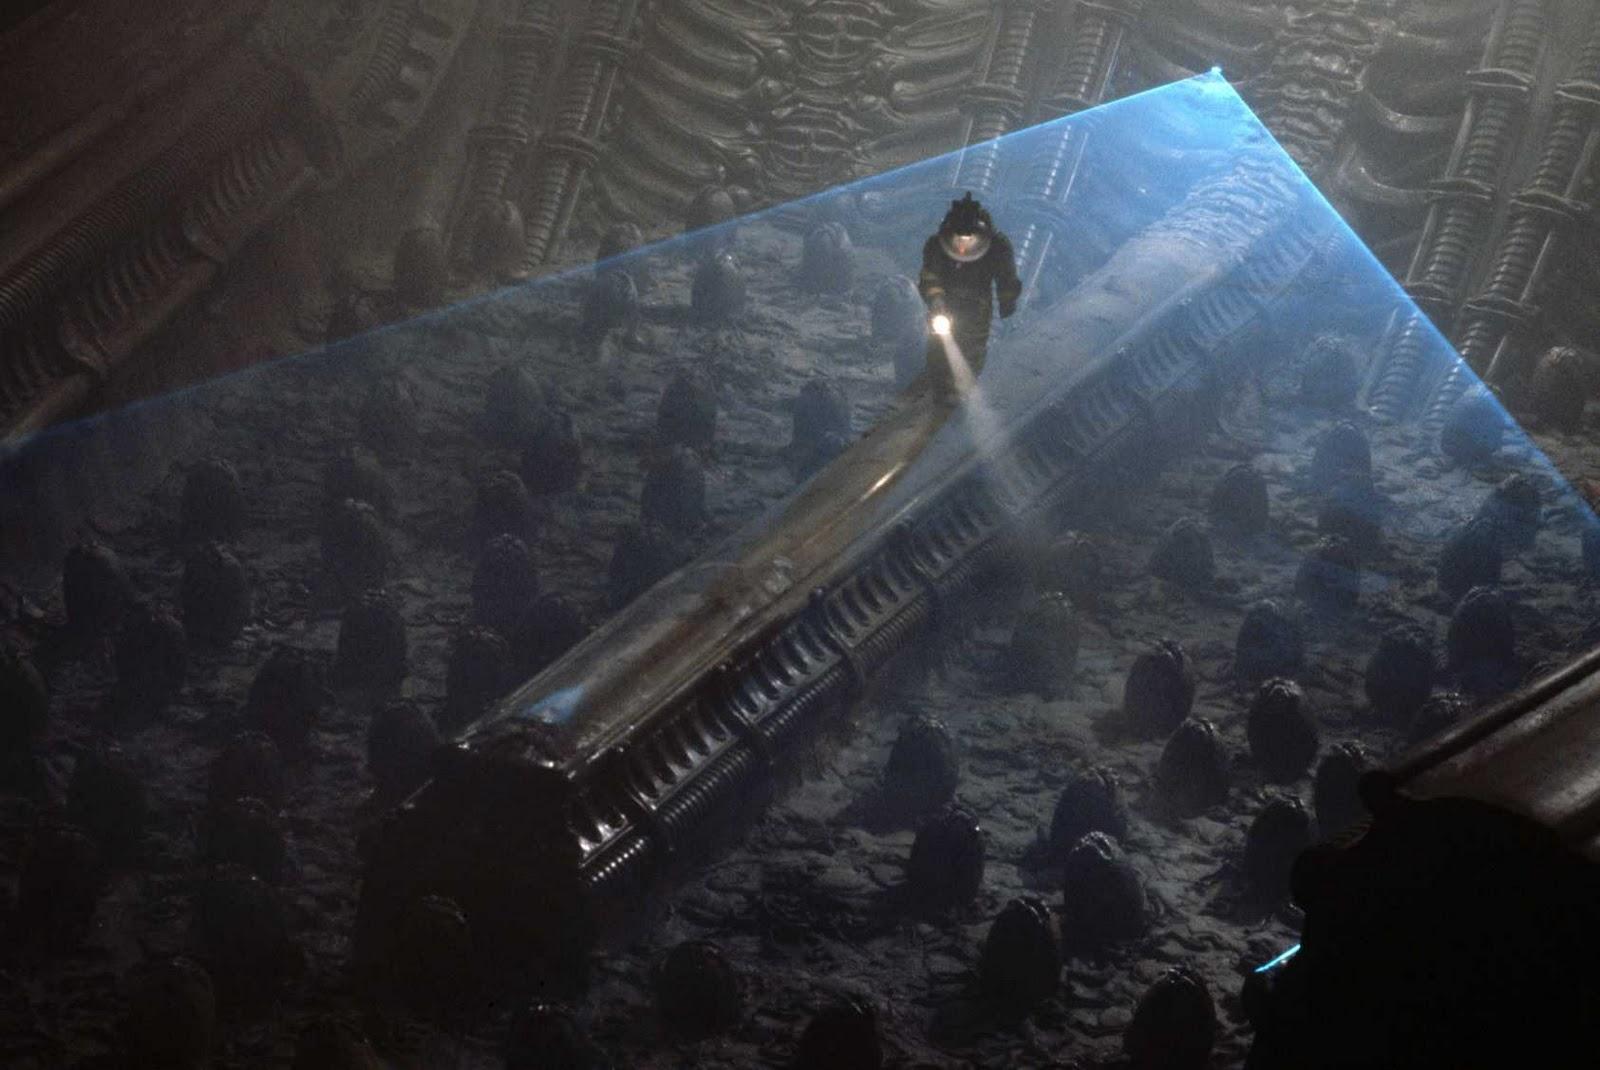 Inside The Derelicta Brilliant Piece Of Production Design Kane (john  Hurt) Discovers The Alien Pods